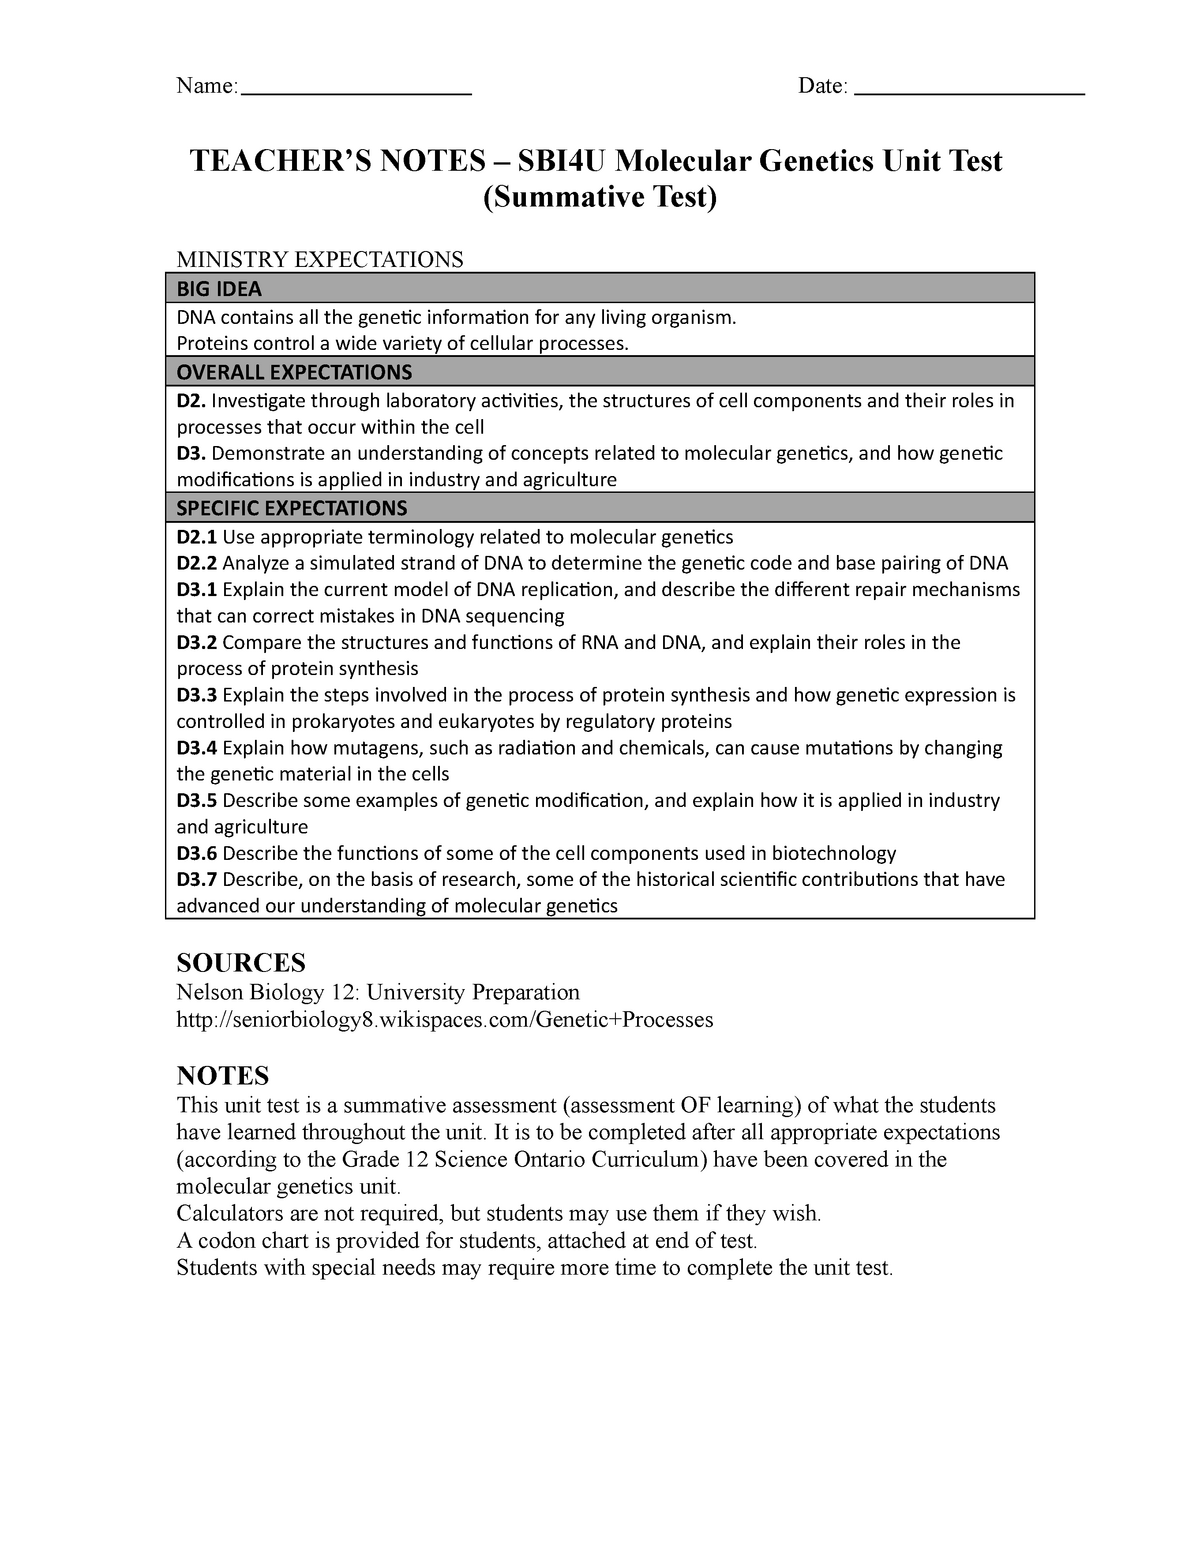 SBI4U – Molecular Genetics Unit Test Teacher - NUR3048